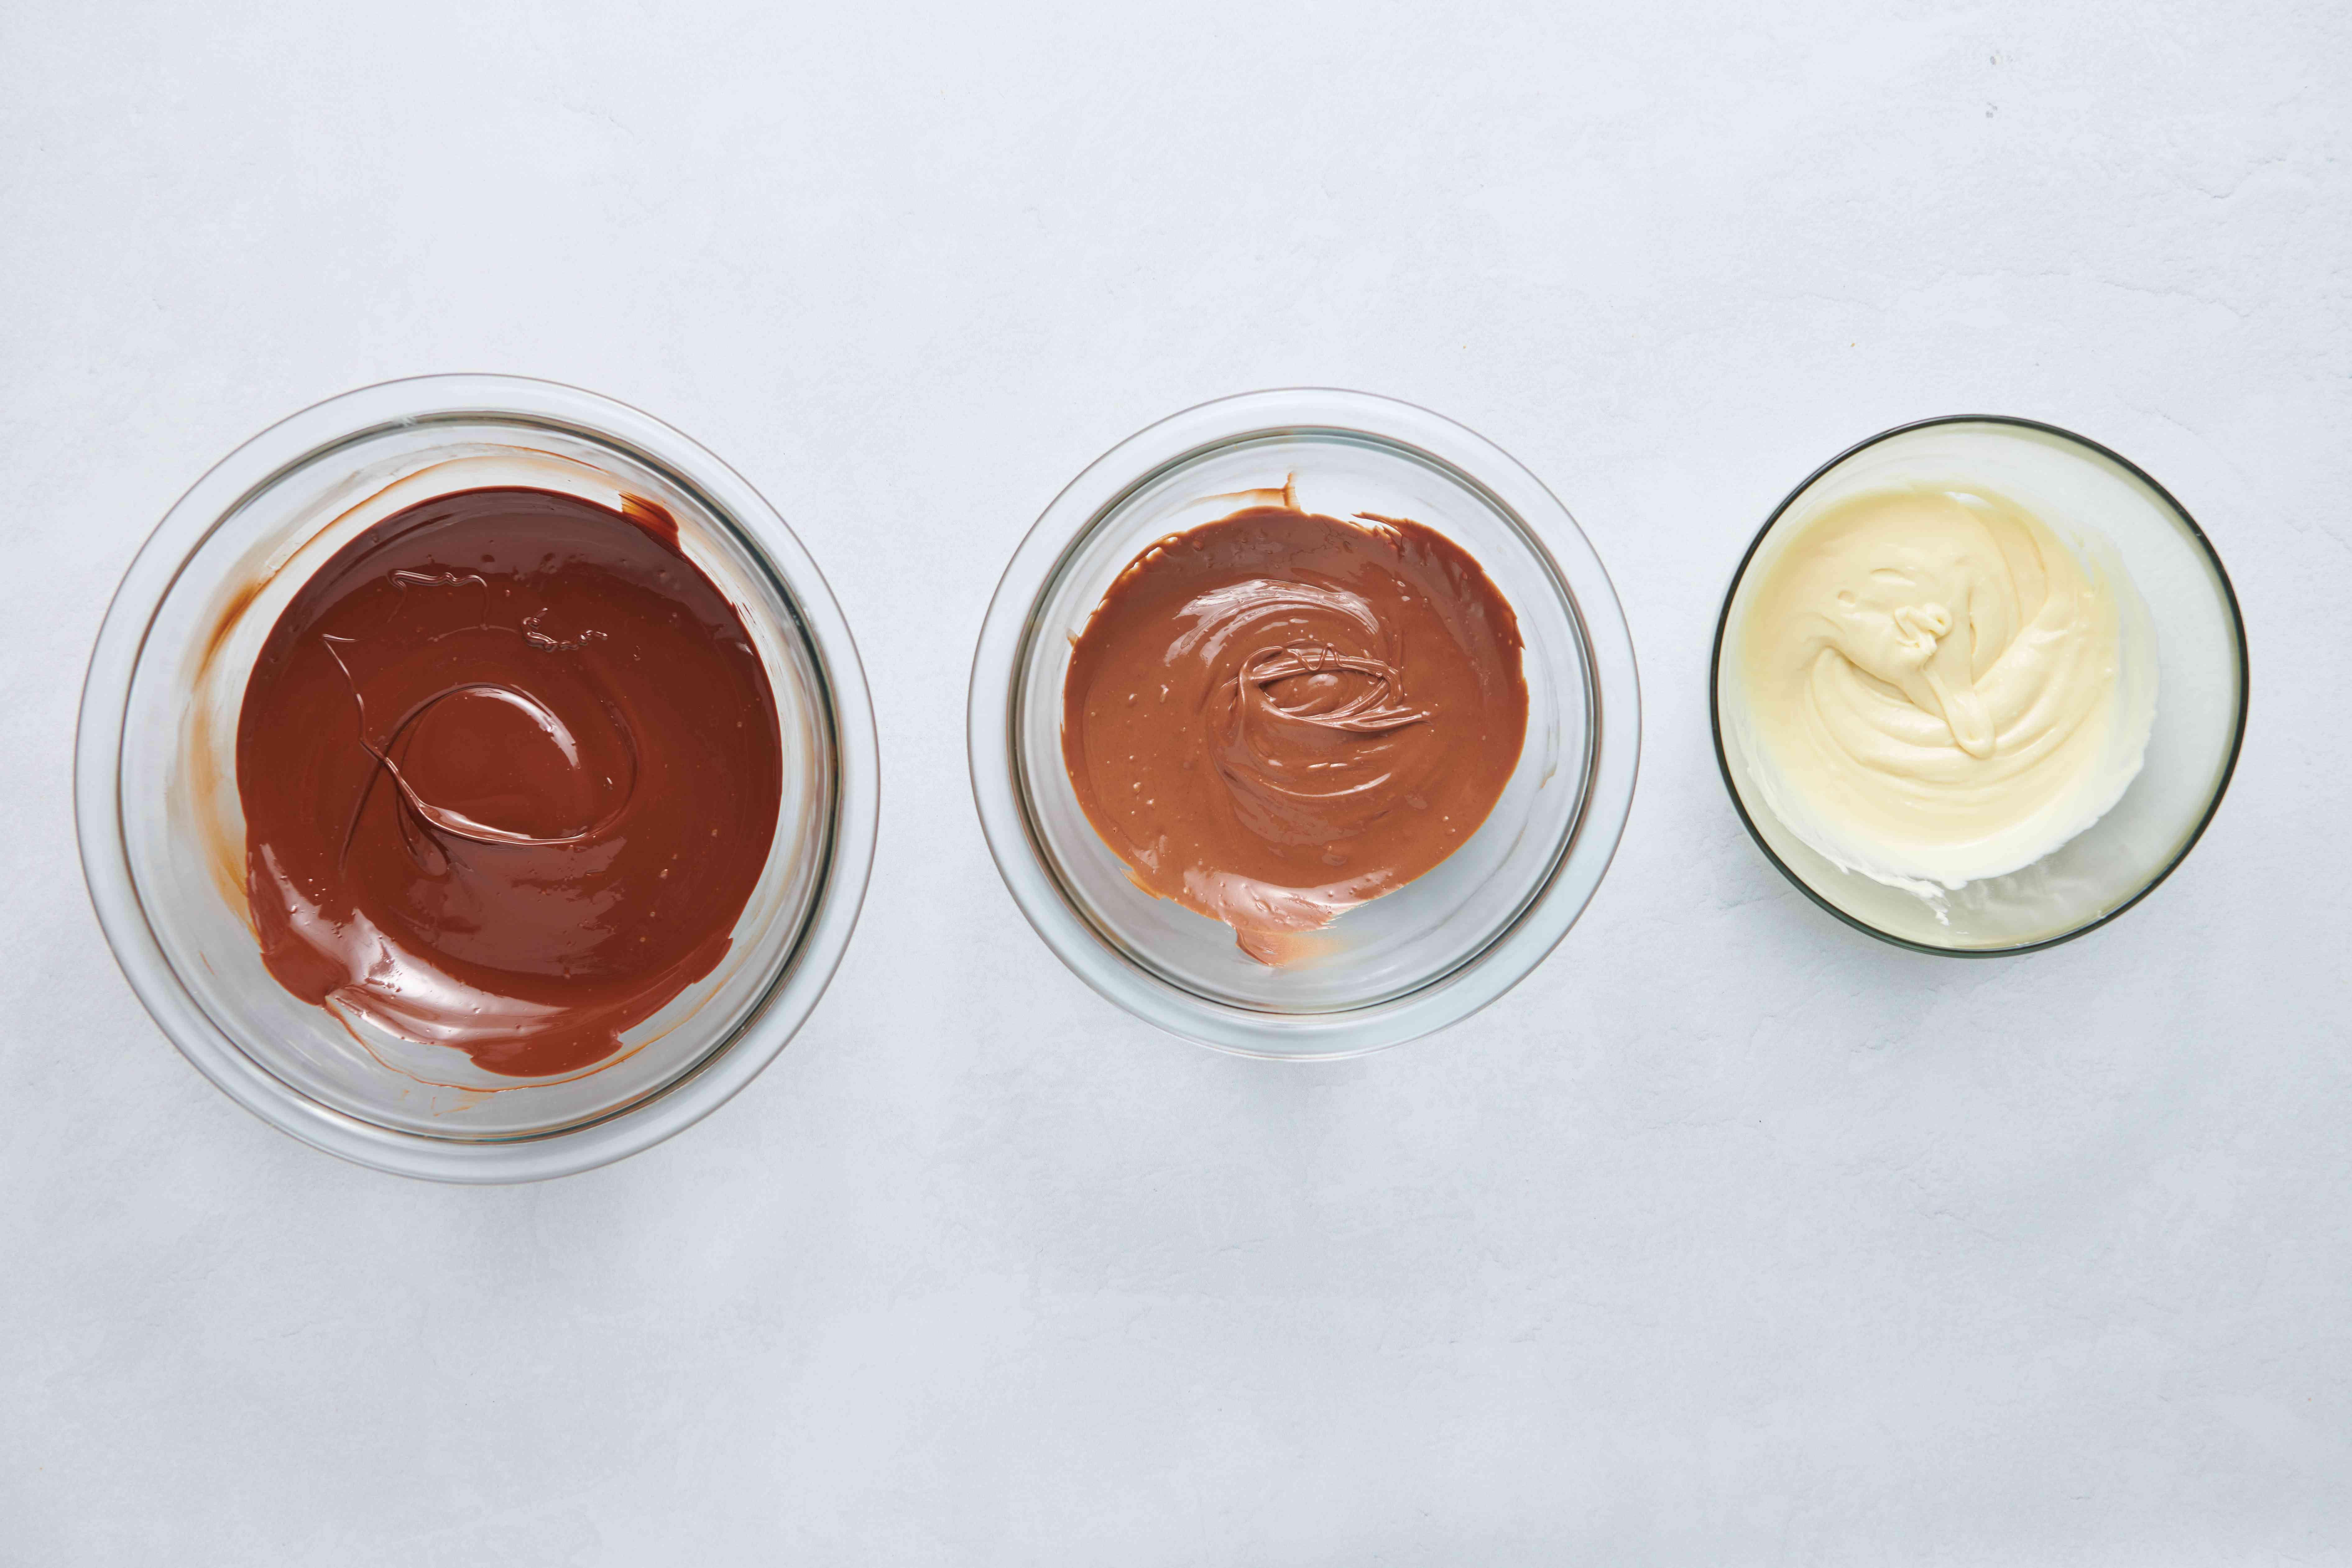 dark, milk and white chocolate in bowls